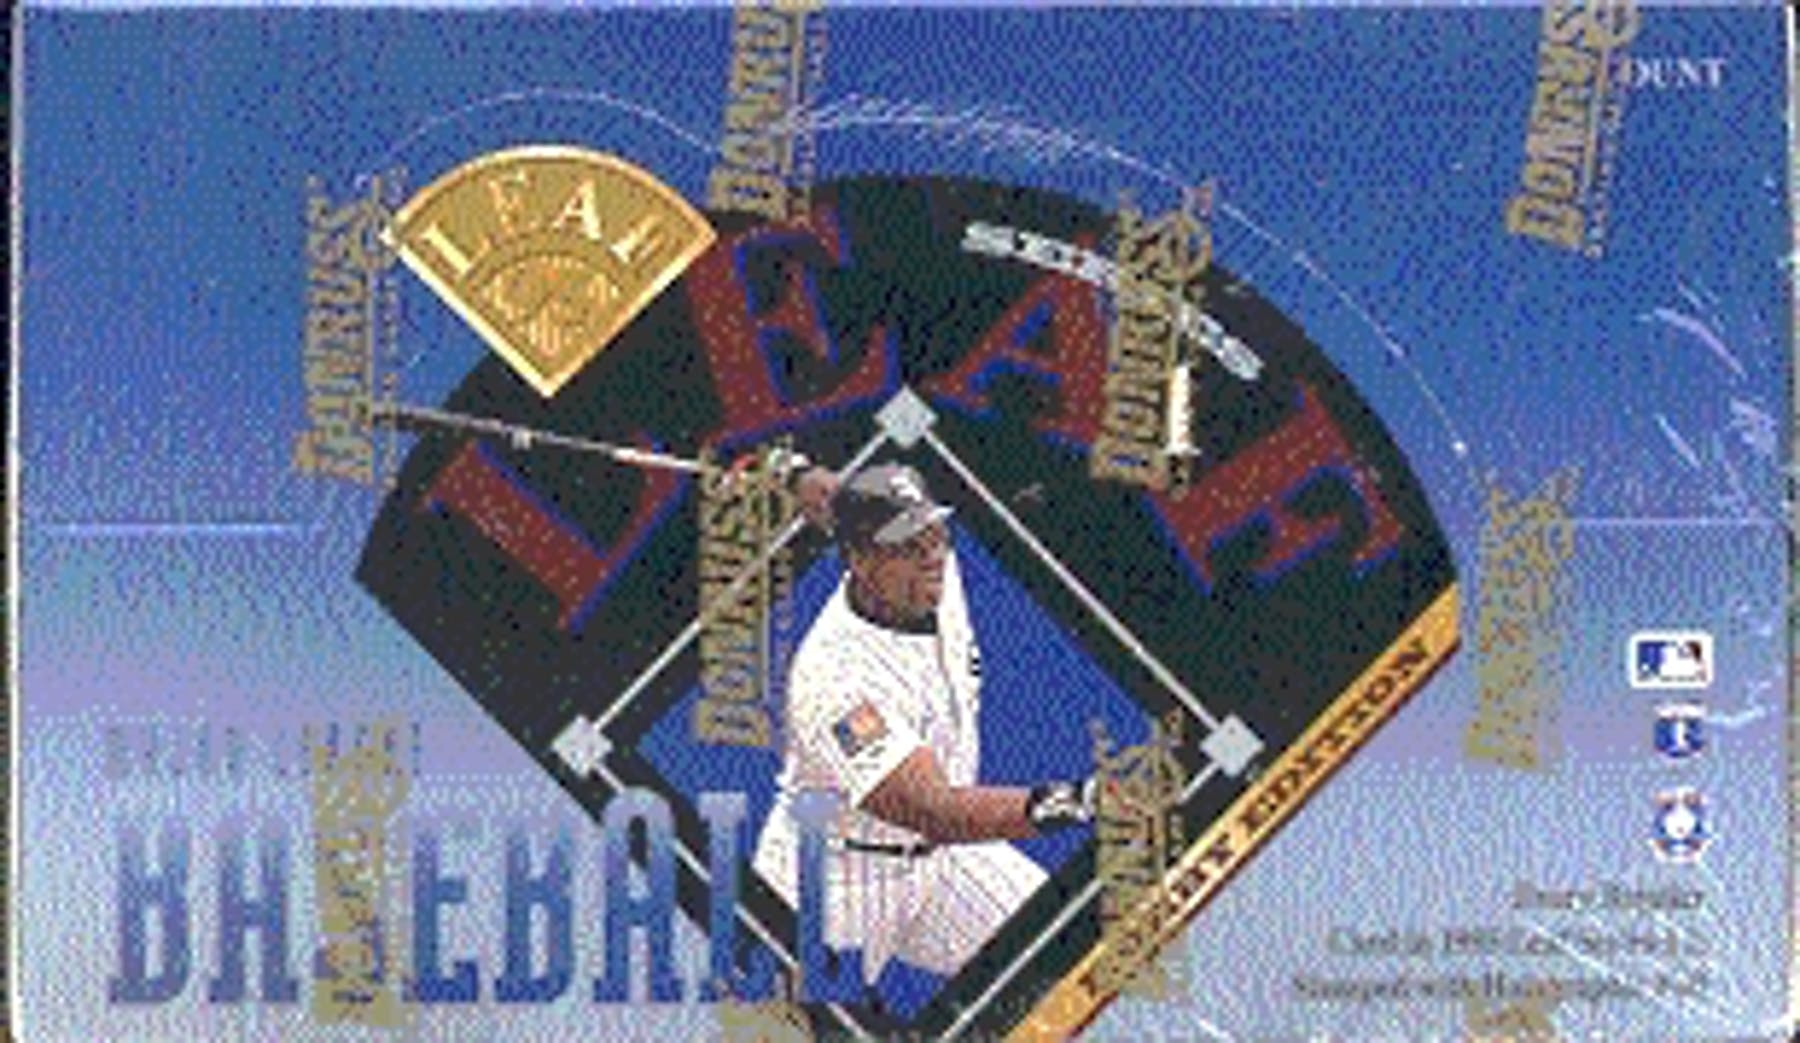 1995 Leaf Series 1 Baseball Hobby Box Da Card World